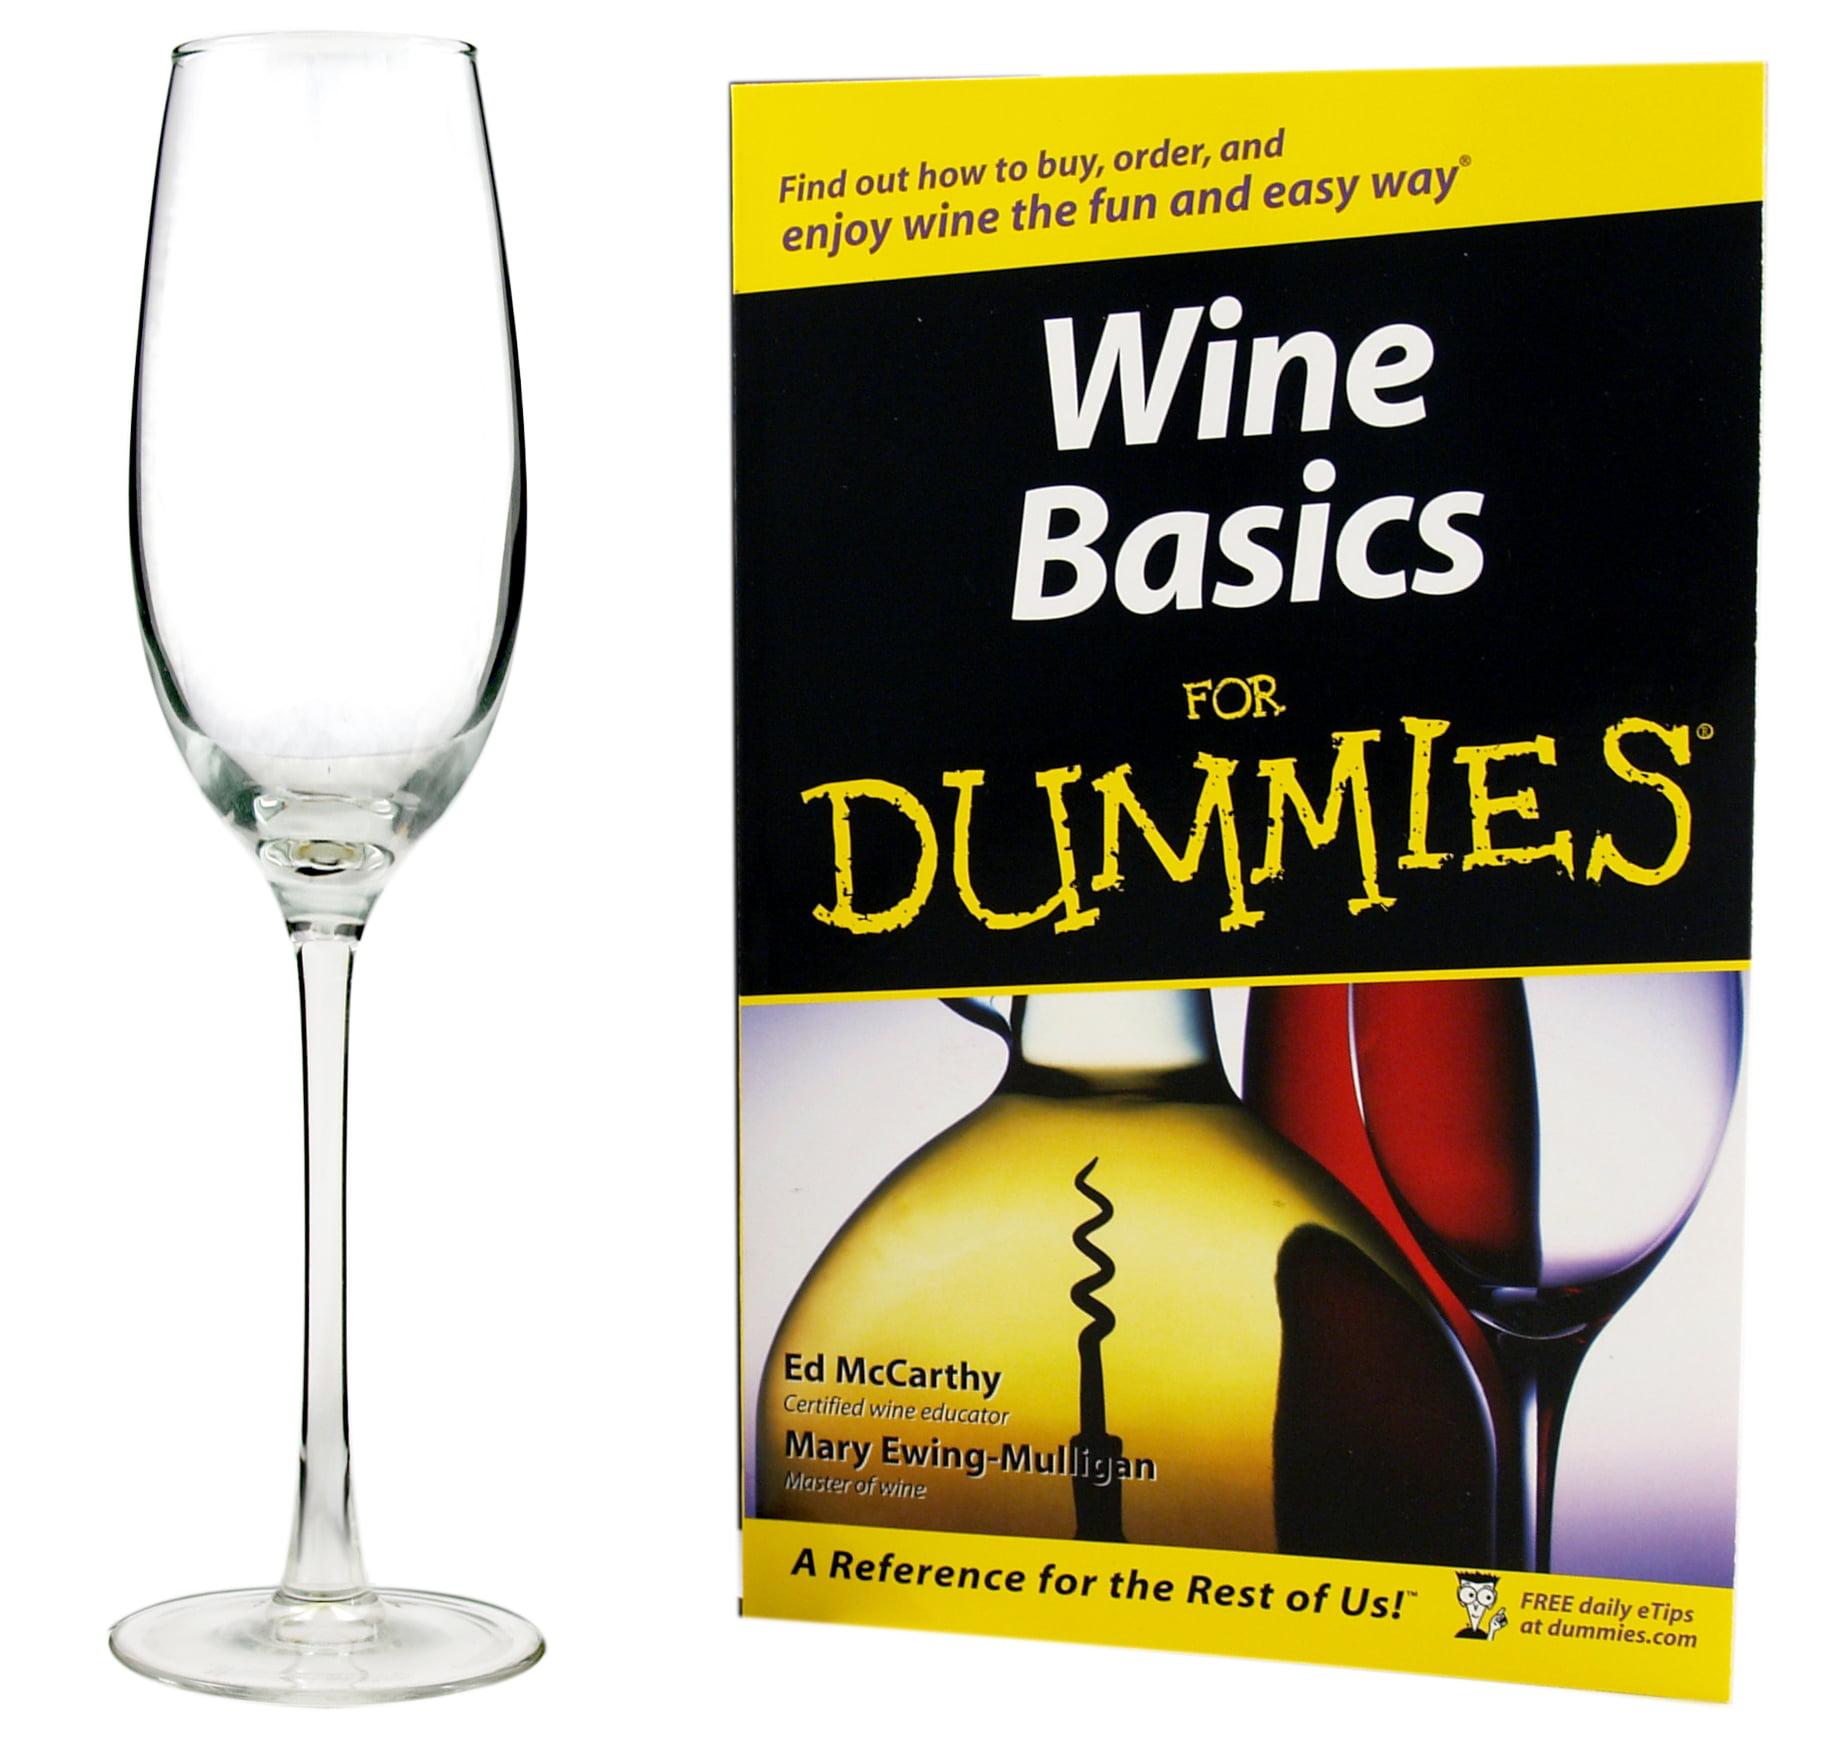 Luminarc Wine For Dummies Sparkling Wine Glass Set with Book 5 Piece